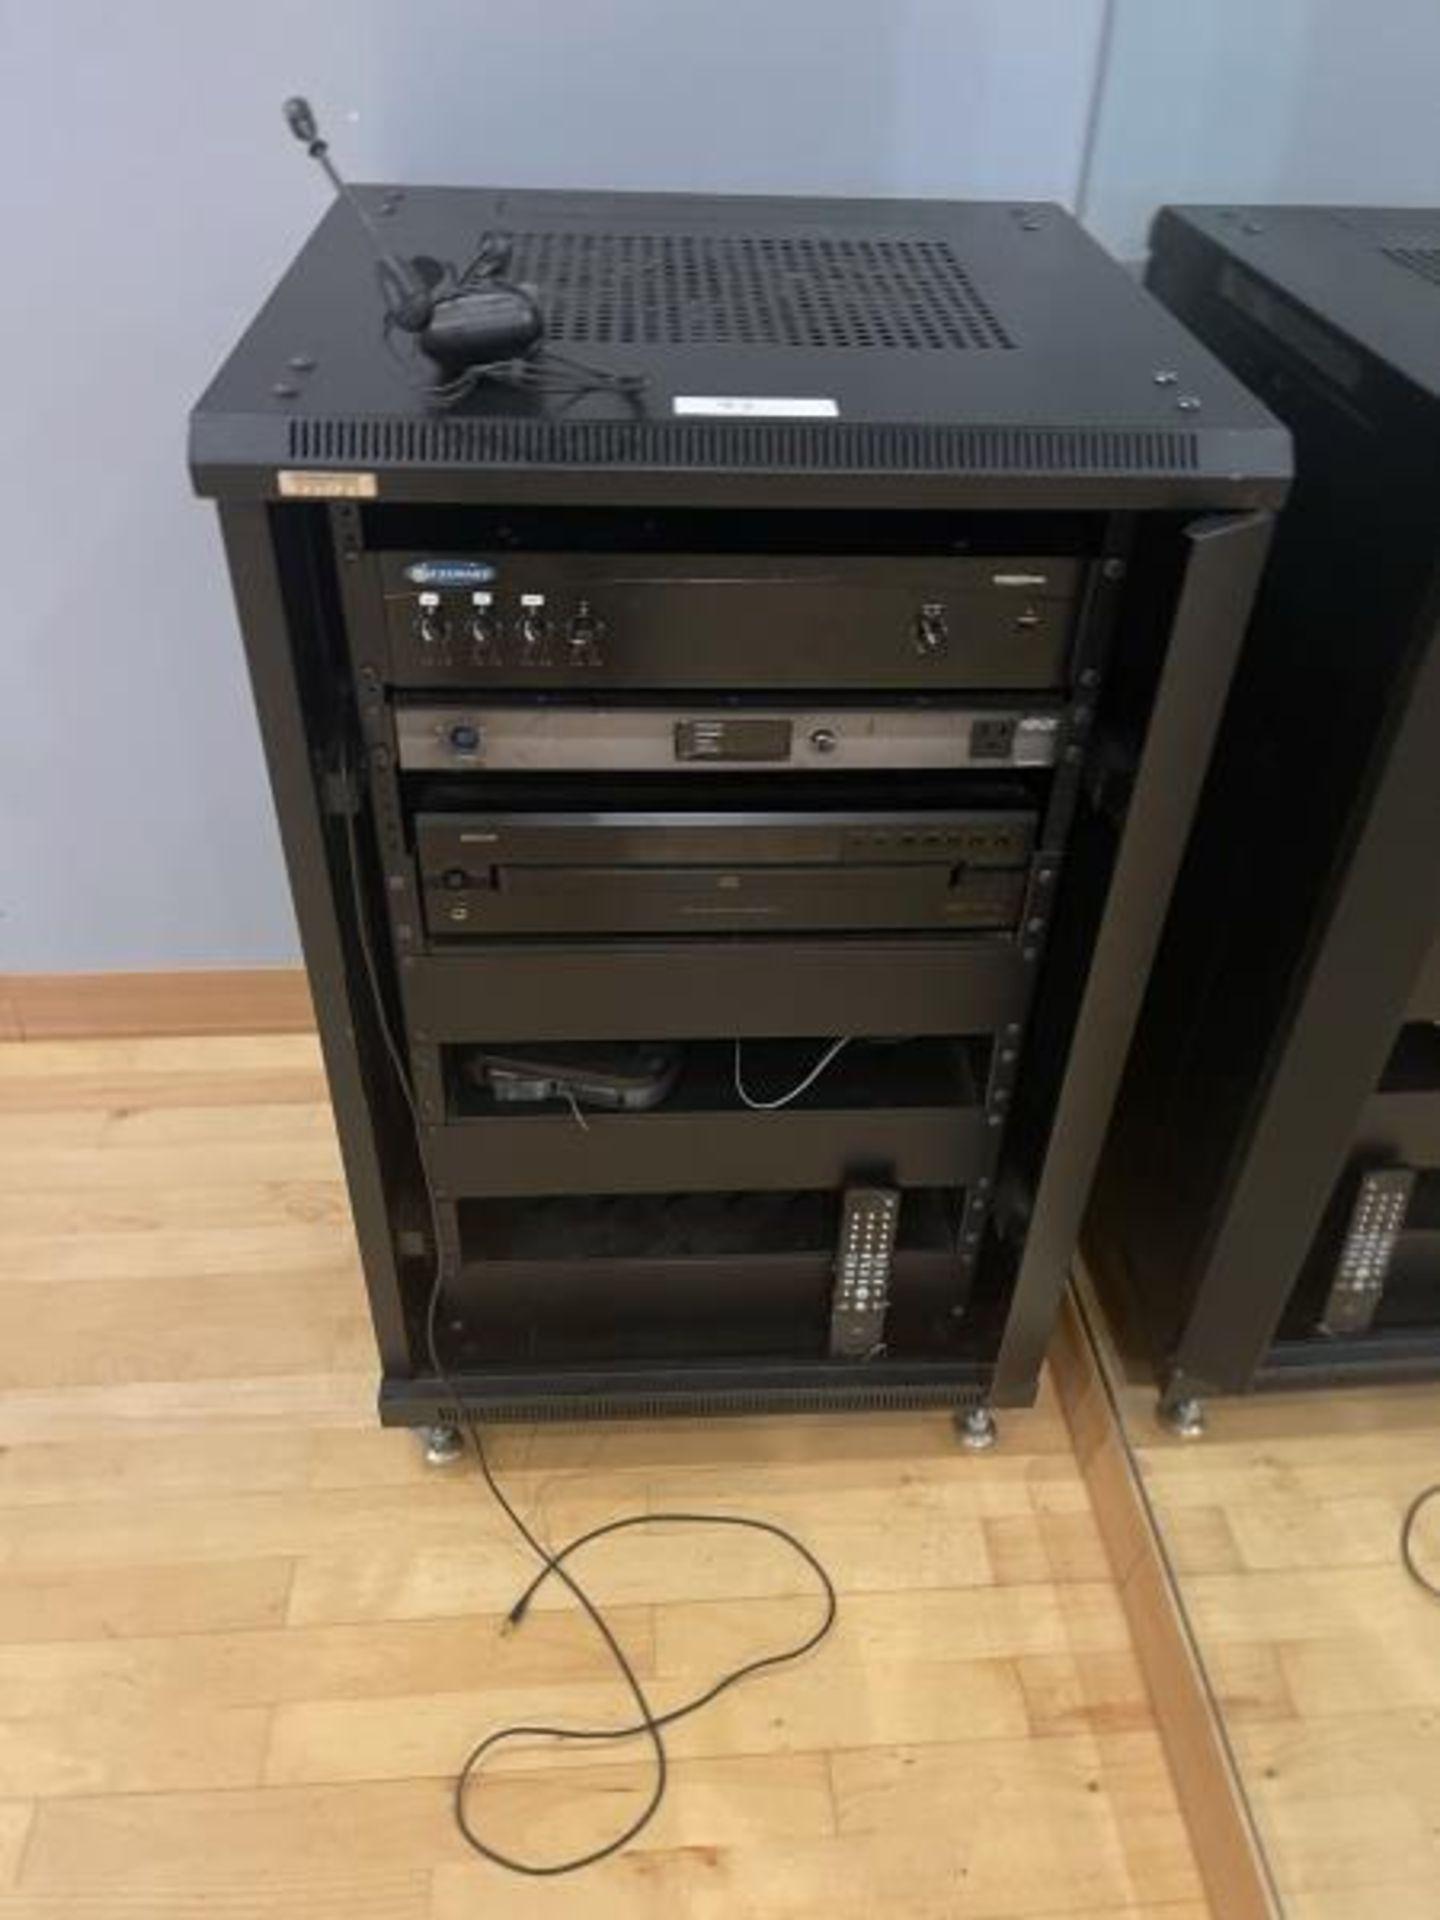 Omnimount Design Audio Cabinet with Crown 1160MA Tripplite AV3500PD, Denon 5 Disk CD Changer, Shure